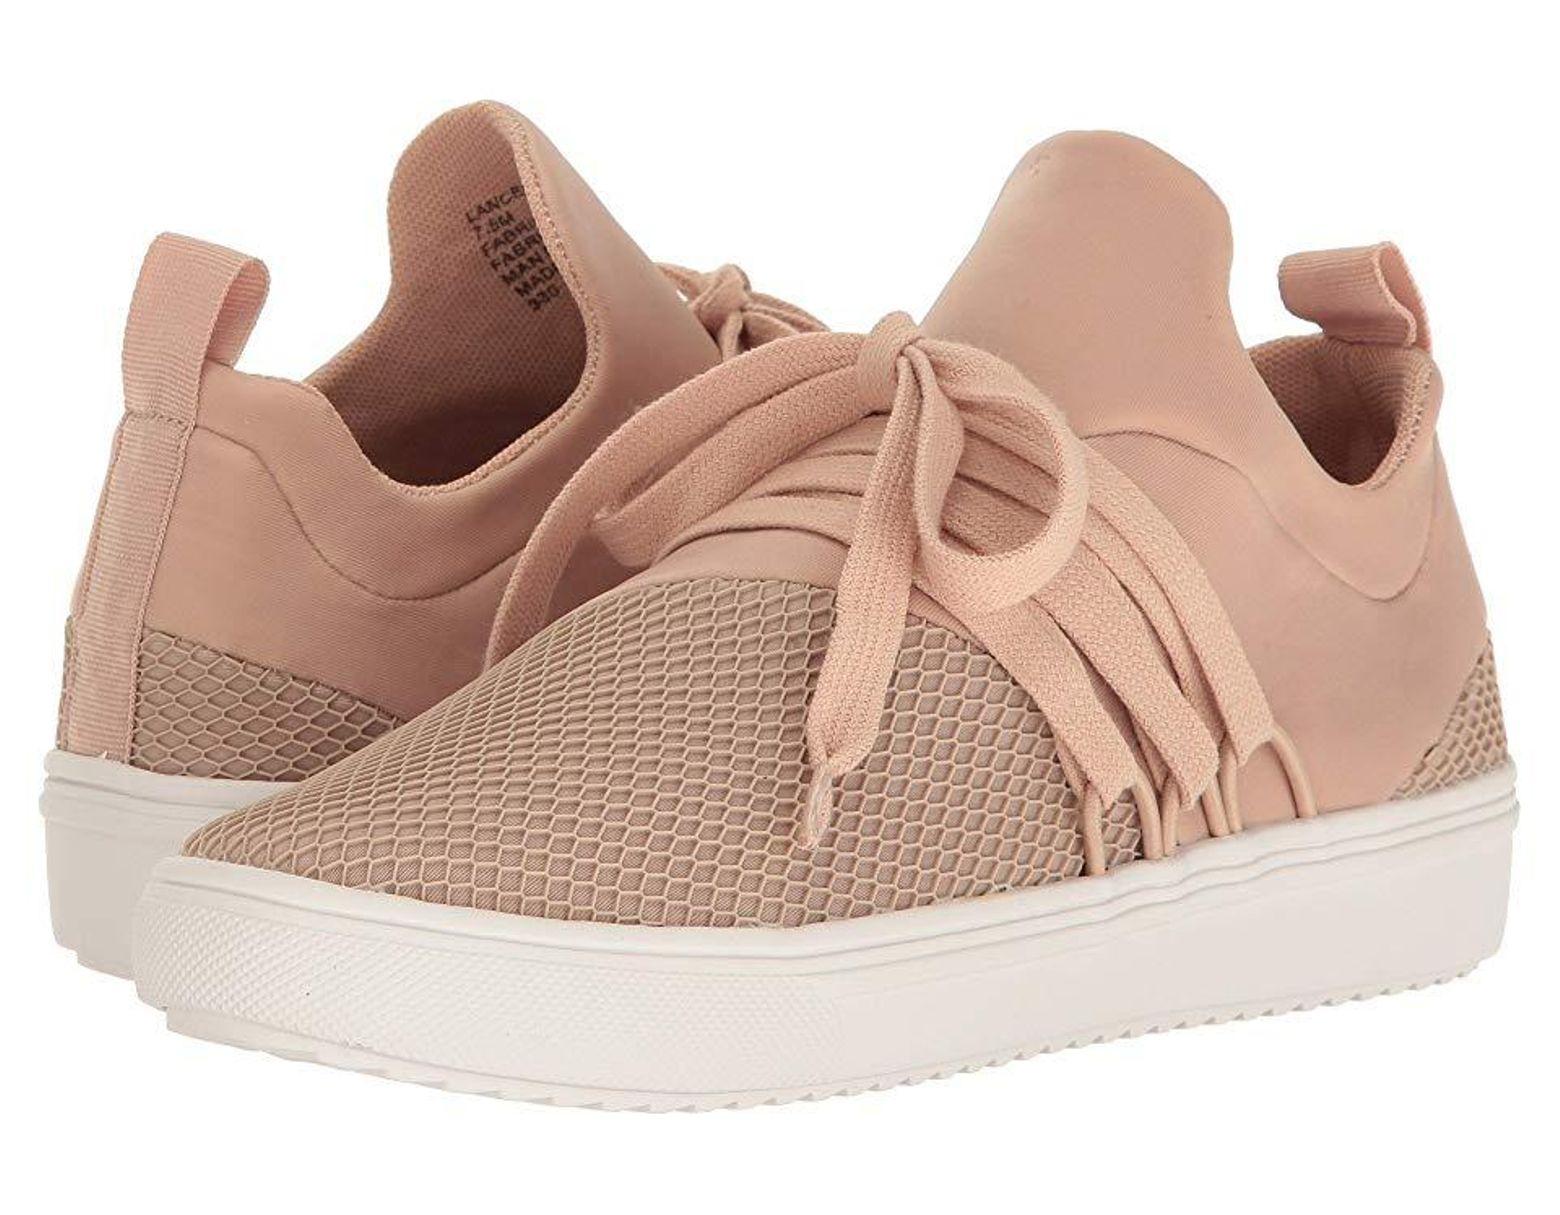 90eeaa5e48f Steve Madden Lancer Sneaker (blush) Shoes in Pink - Lyst